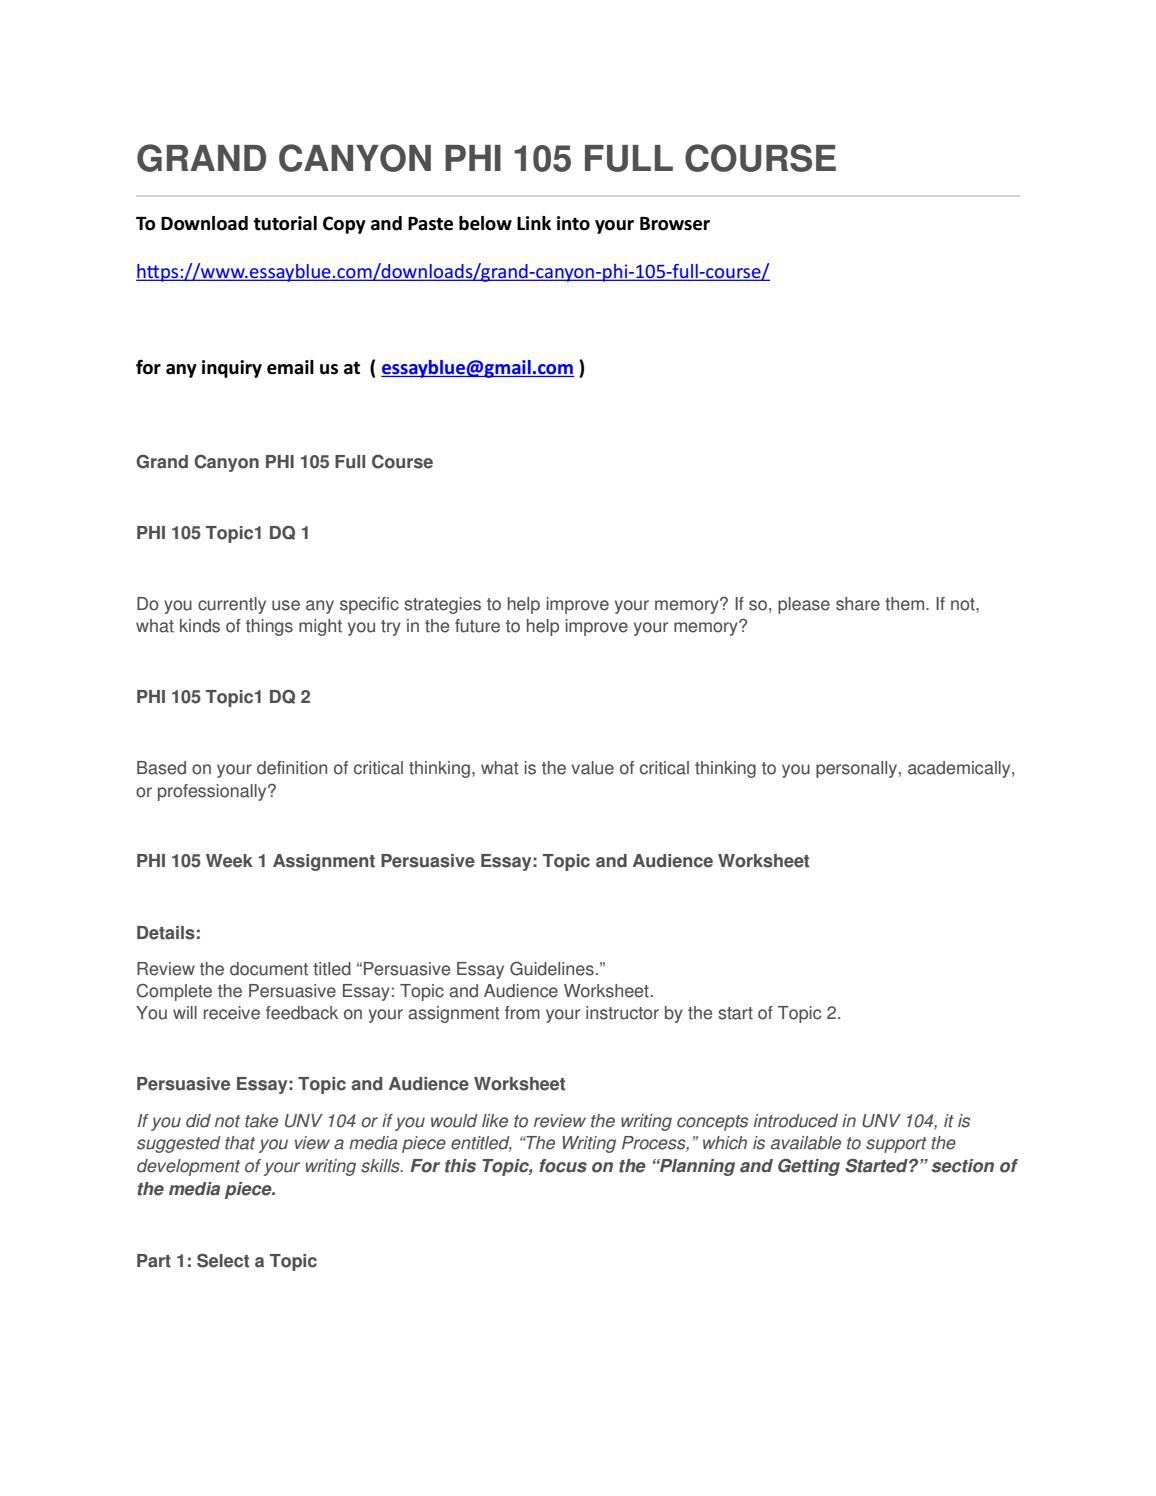 phi 105 persuasive letter View homework help - glendahollaway_persuasiveessaytopicworksheet from  phi 105 at grand canyon university name: glenda hollaway topic 1:.